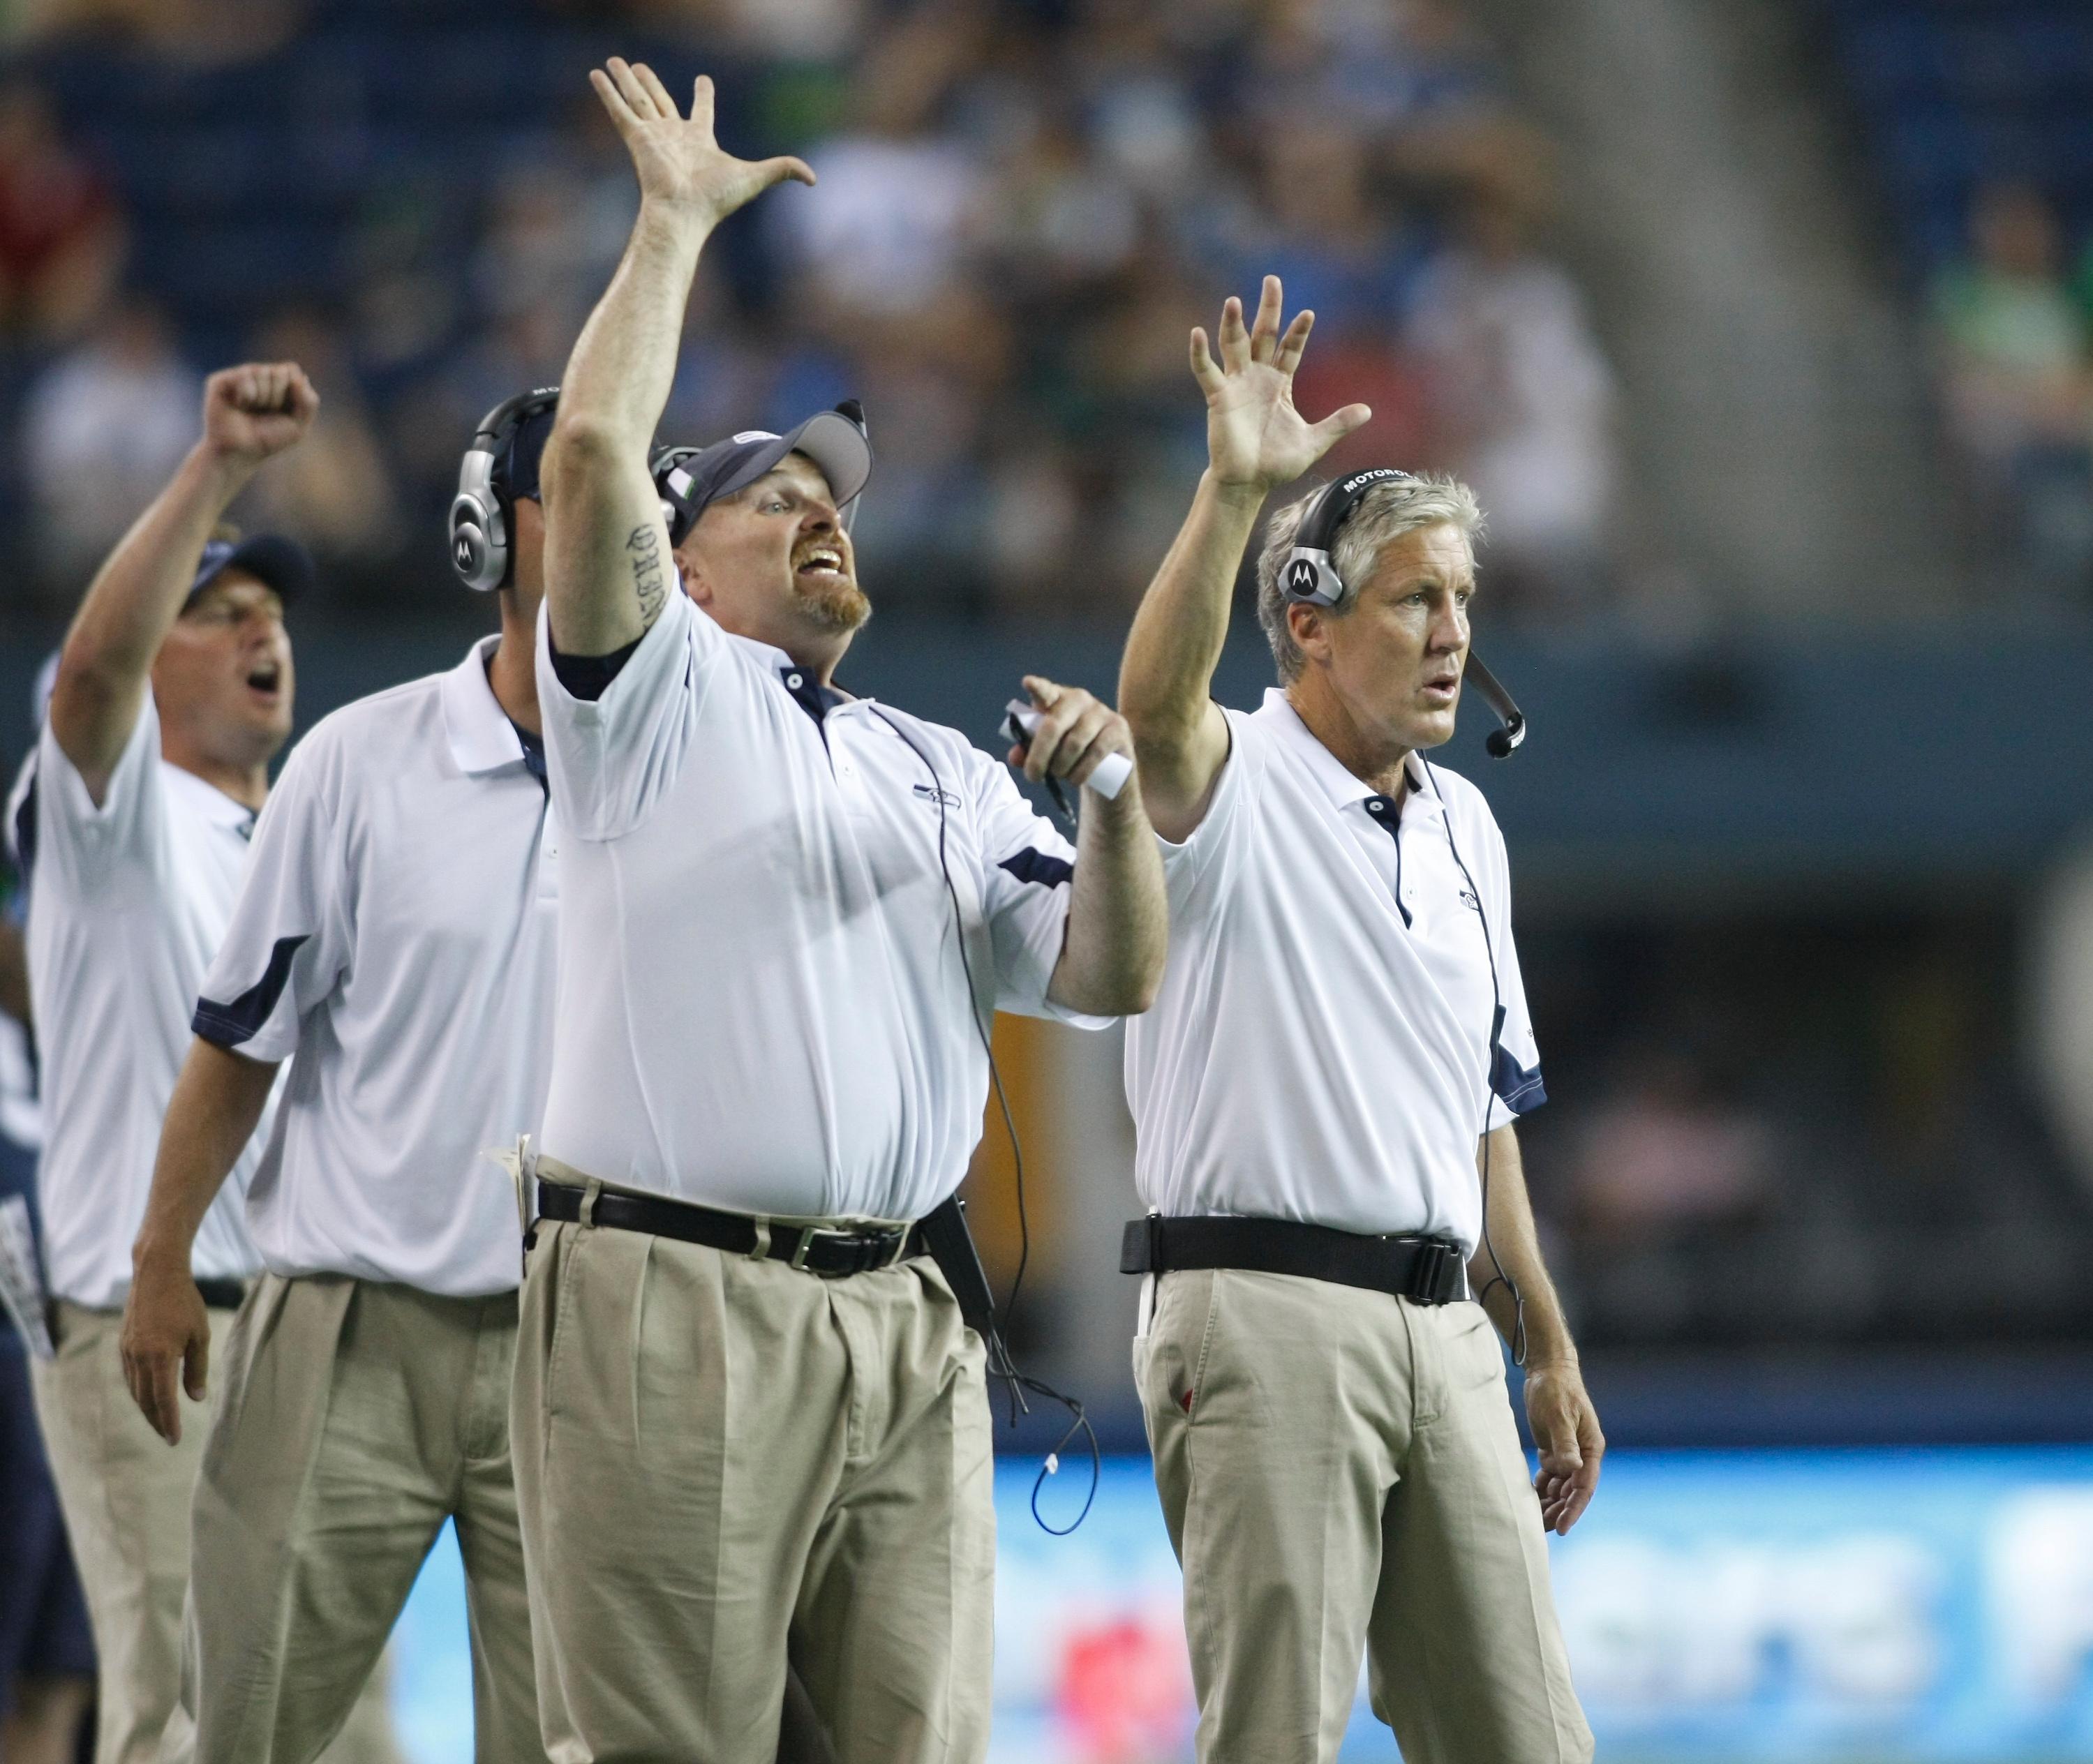 Quinn Returns To Seahawks The Spokesman Review